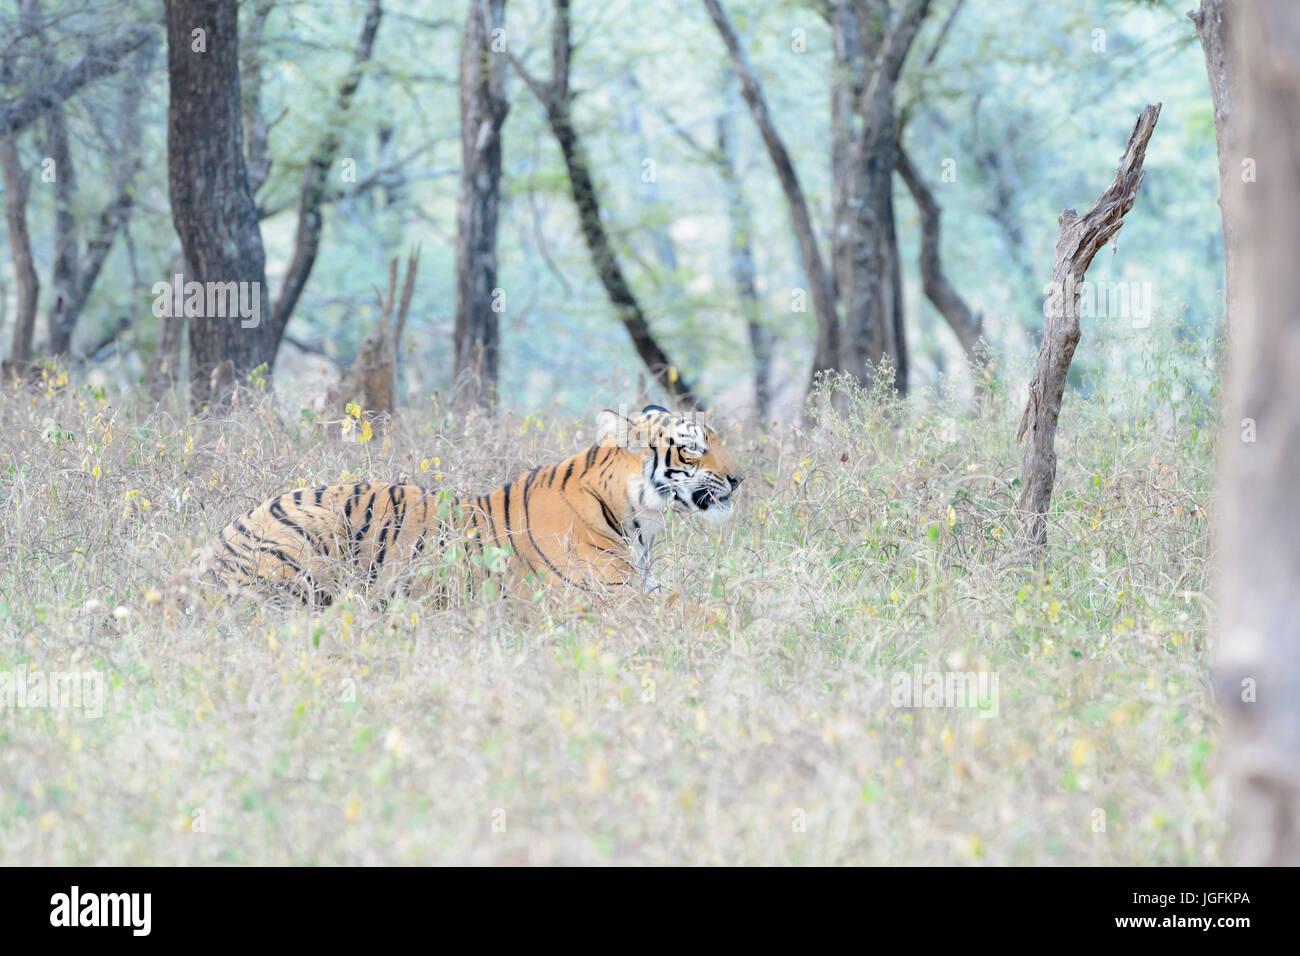 Royal tigre du Bengale (Panthera tigris tigris) couchée en forêt, parc national de Ranthambhore, Rajasthan, Photo Stock